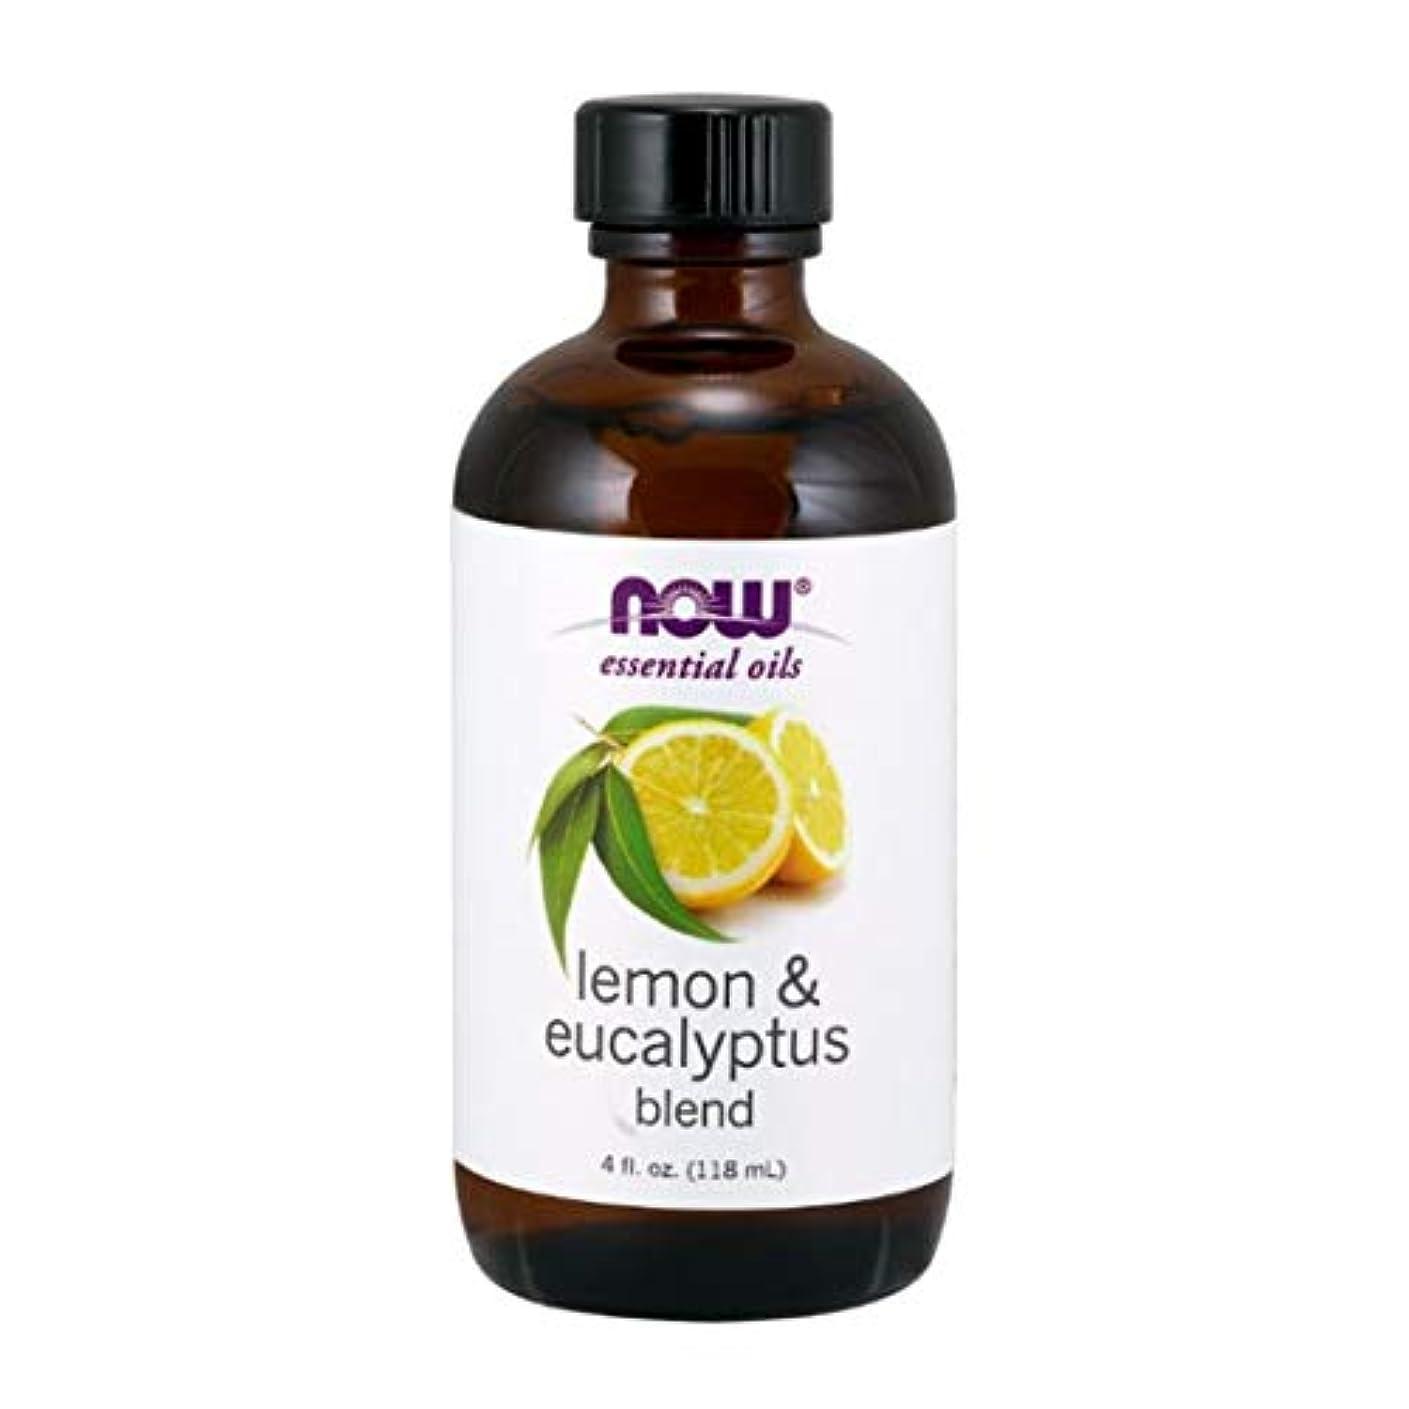 家族ミンチ哲学者Now - Lemon & Eucalyptus Blend With Lemongrass 4 oz (118 ml) [並行輸入品]